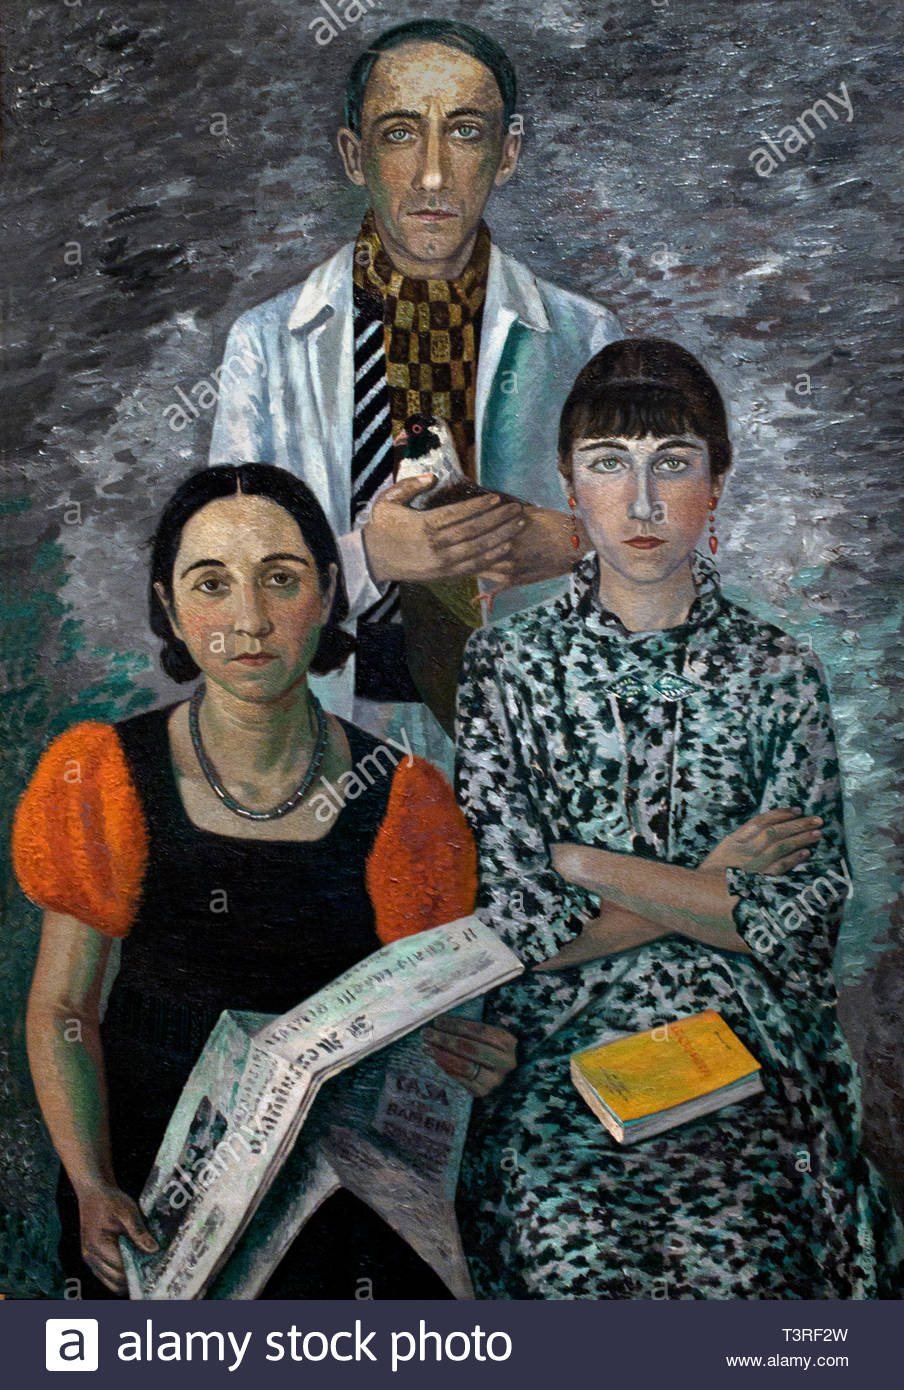 La Famille du peintre - Family of the painter 1936  by Gino Severini born in 1883 Italian painter (Futurist movement) Italy - Stock Image